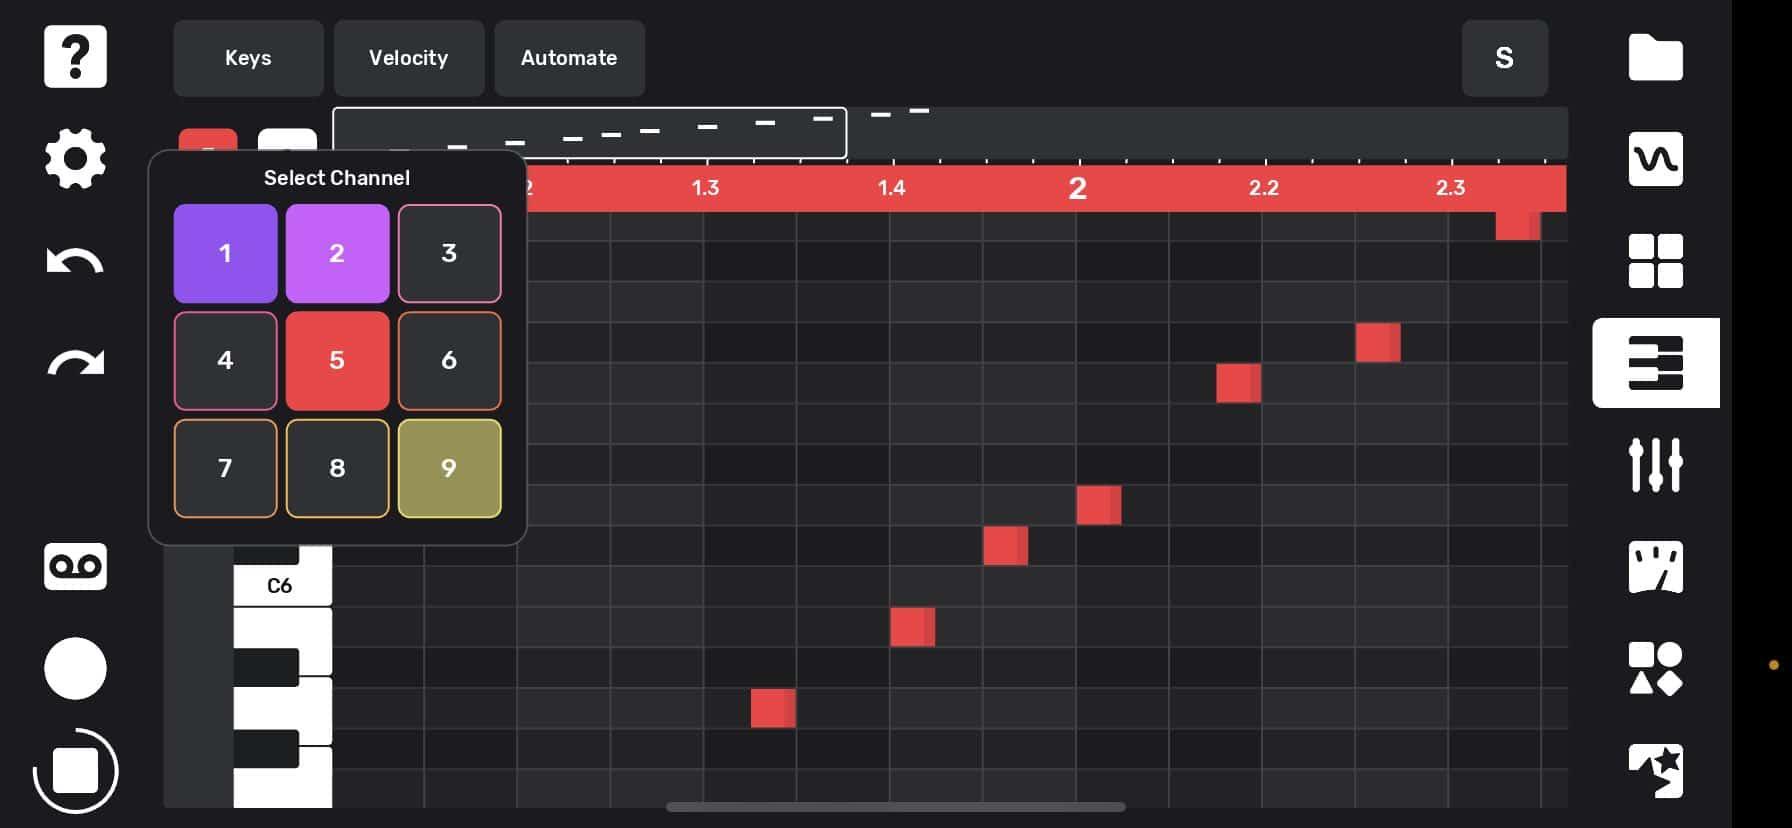 Make Sample-Based Music Anywhere With Andrew Huang's Flip App